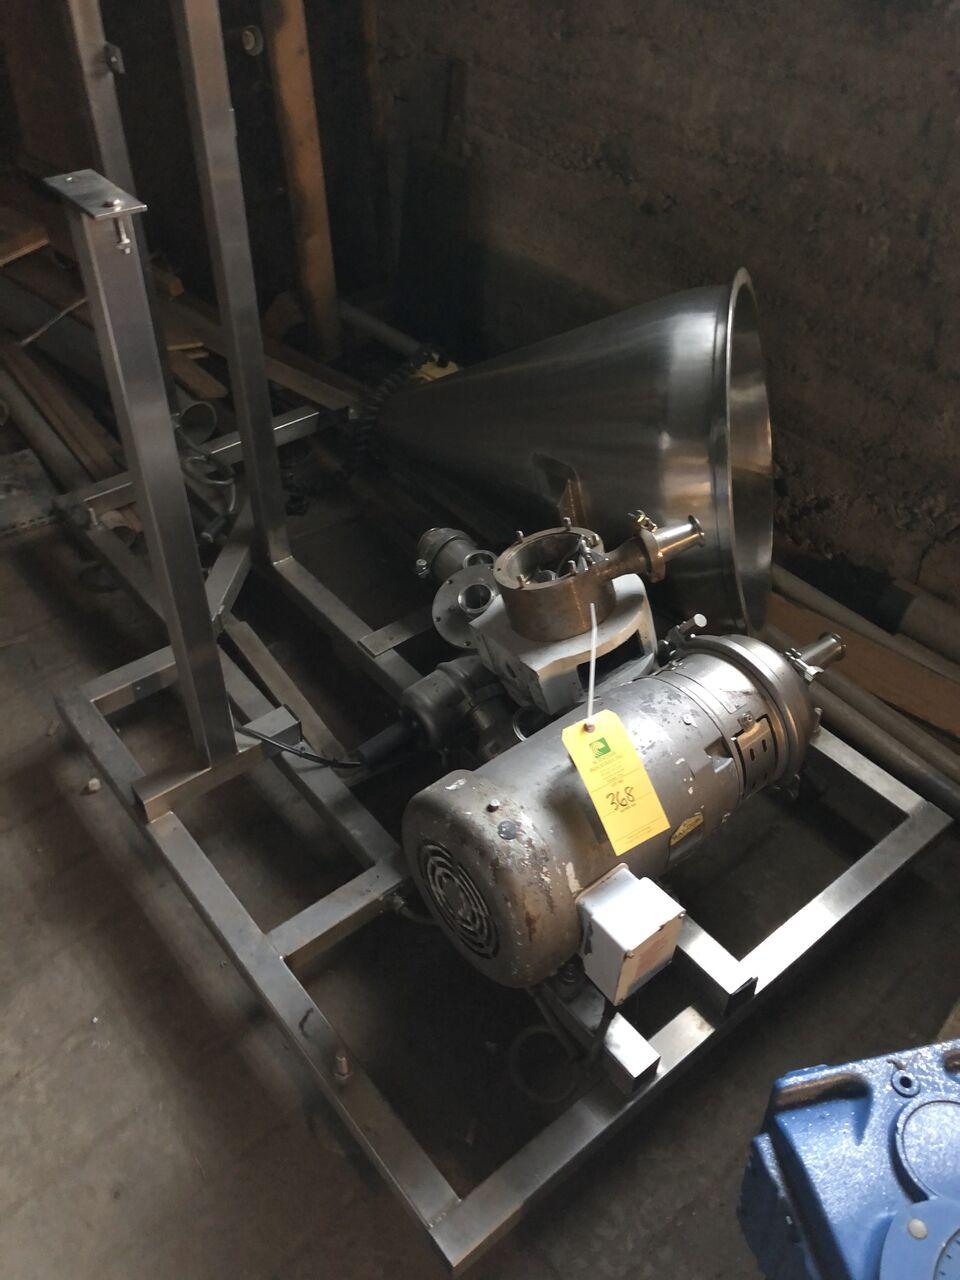 Lot 368 - Baldor 10HP Motor, Comes W/ Stands & A Cylinder